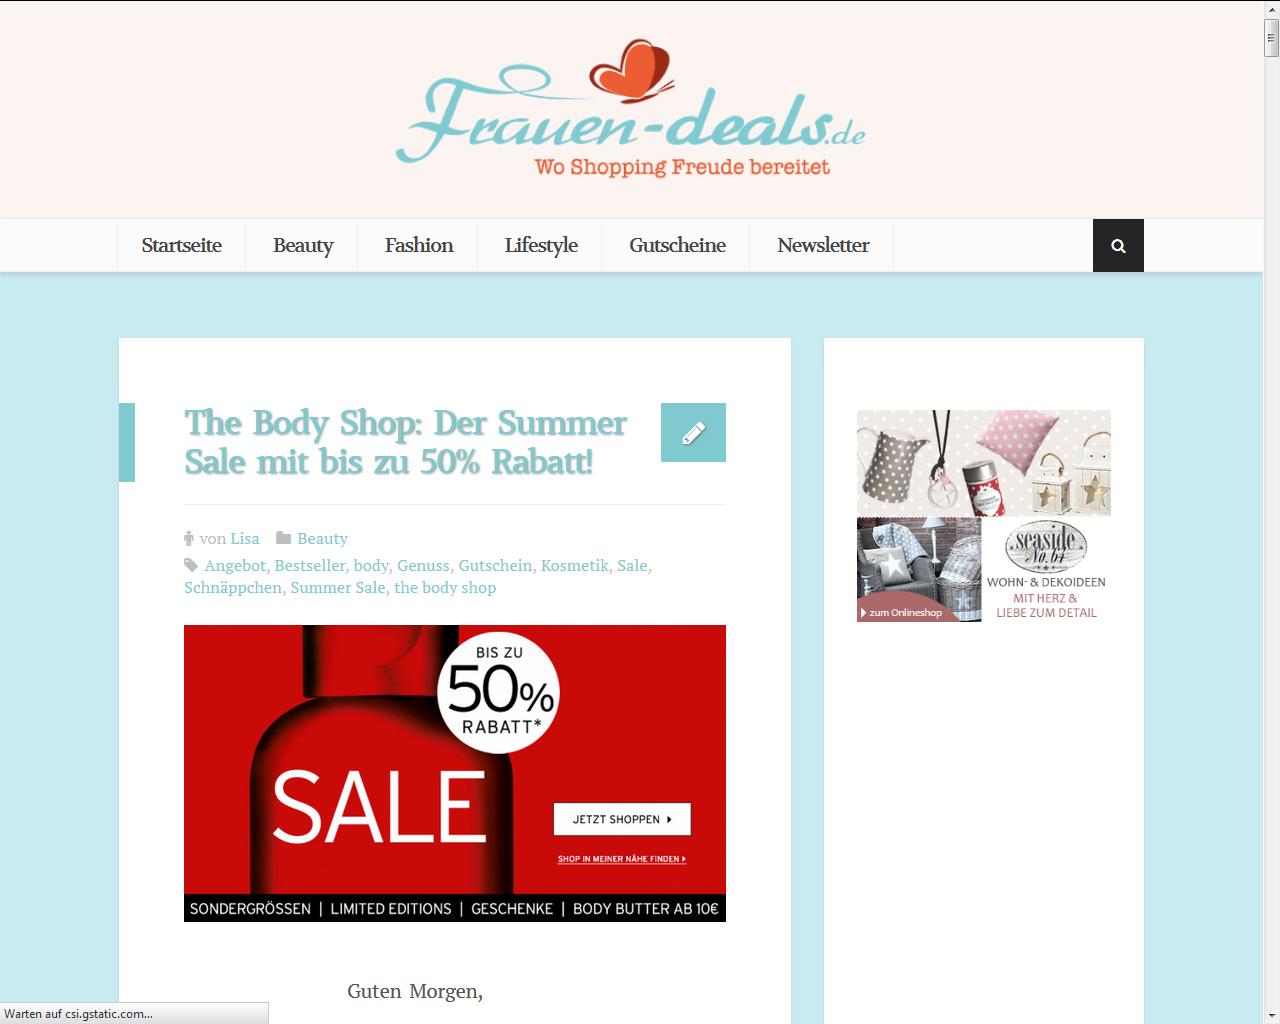 frauen-deals